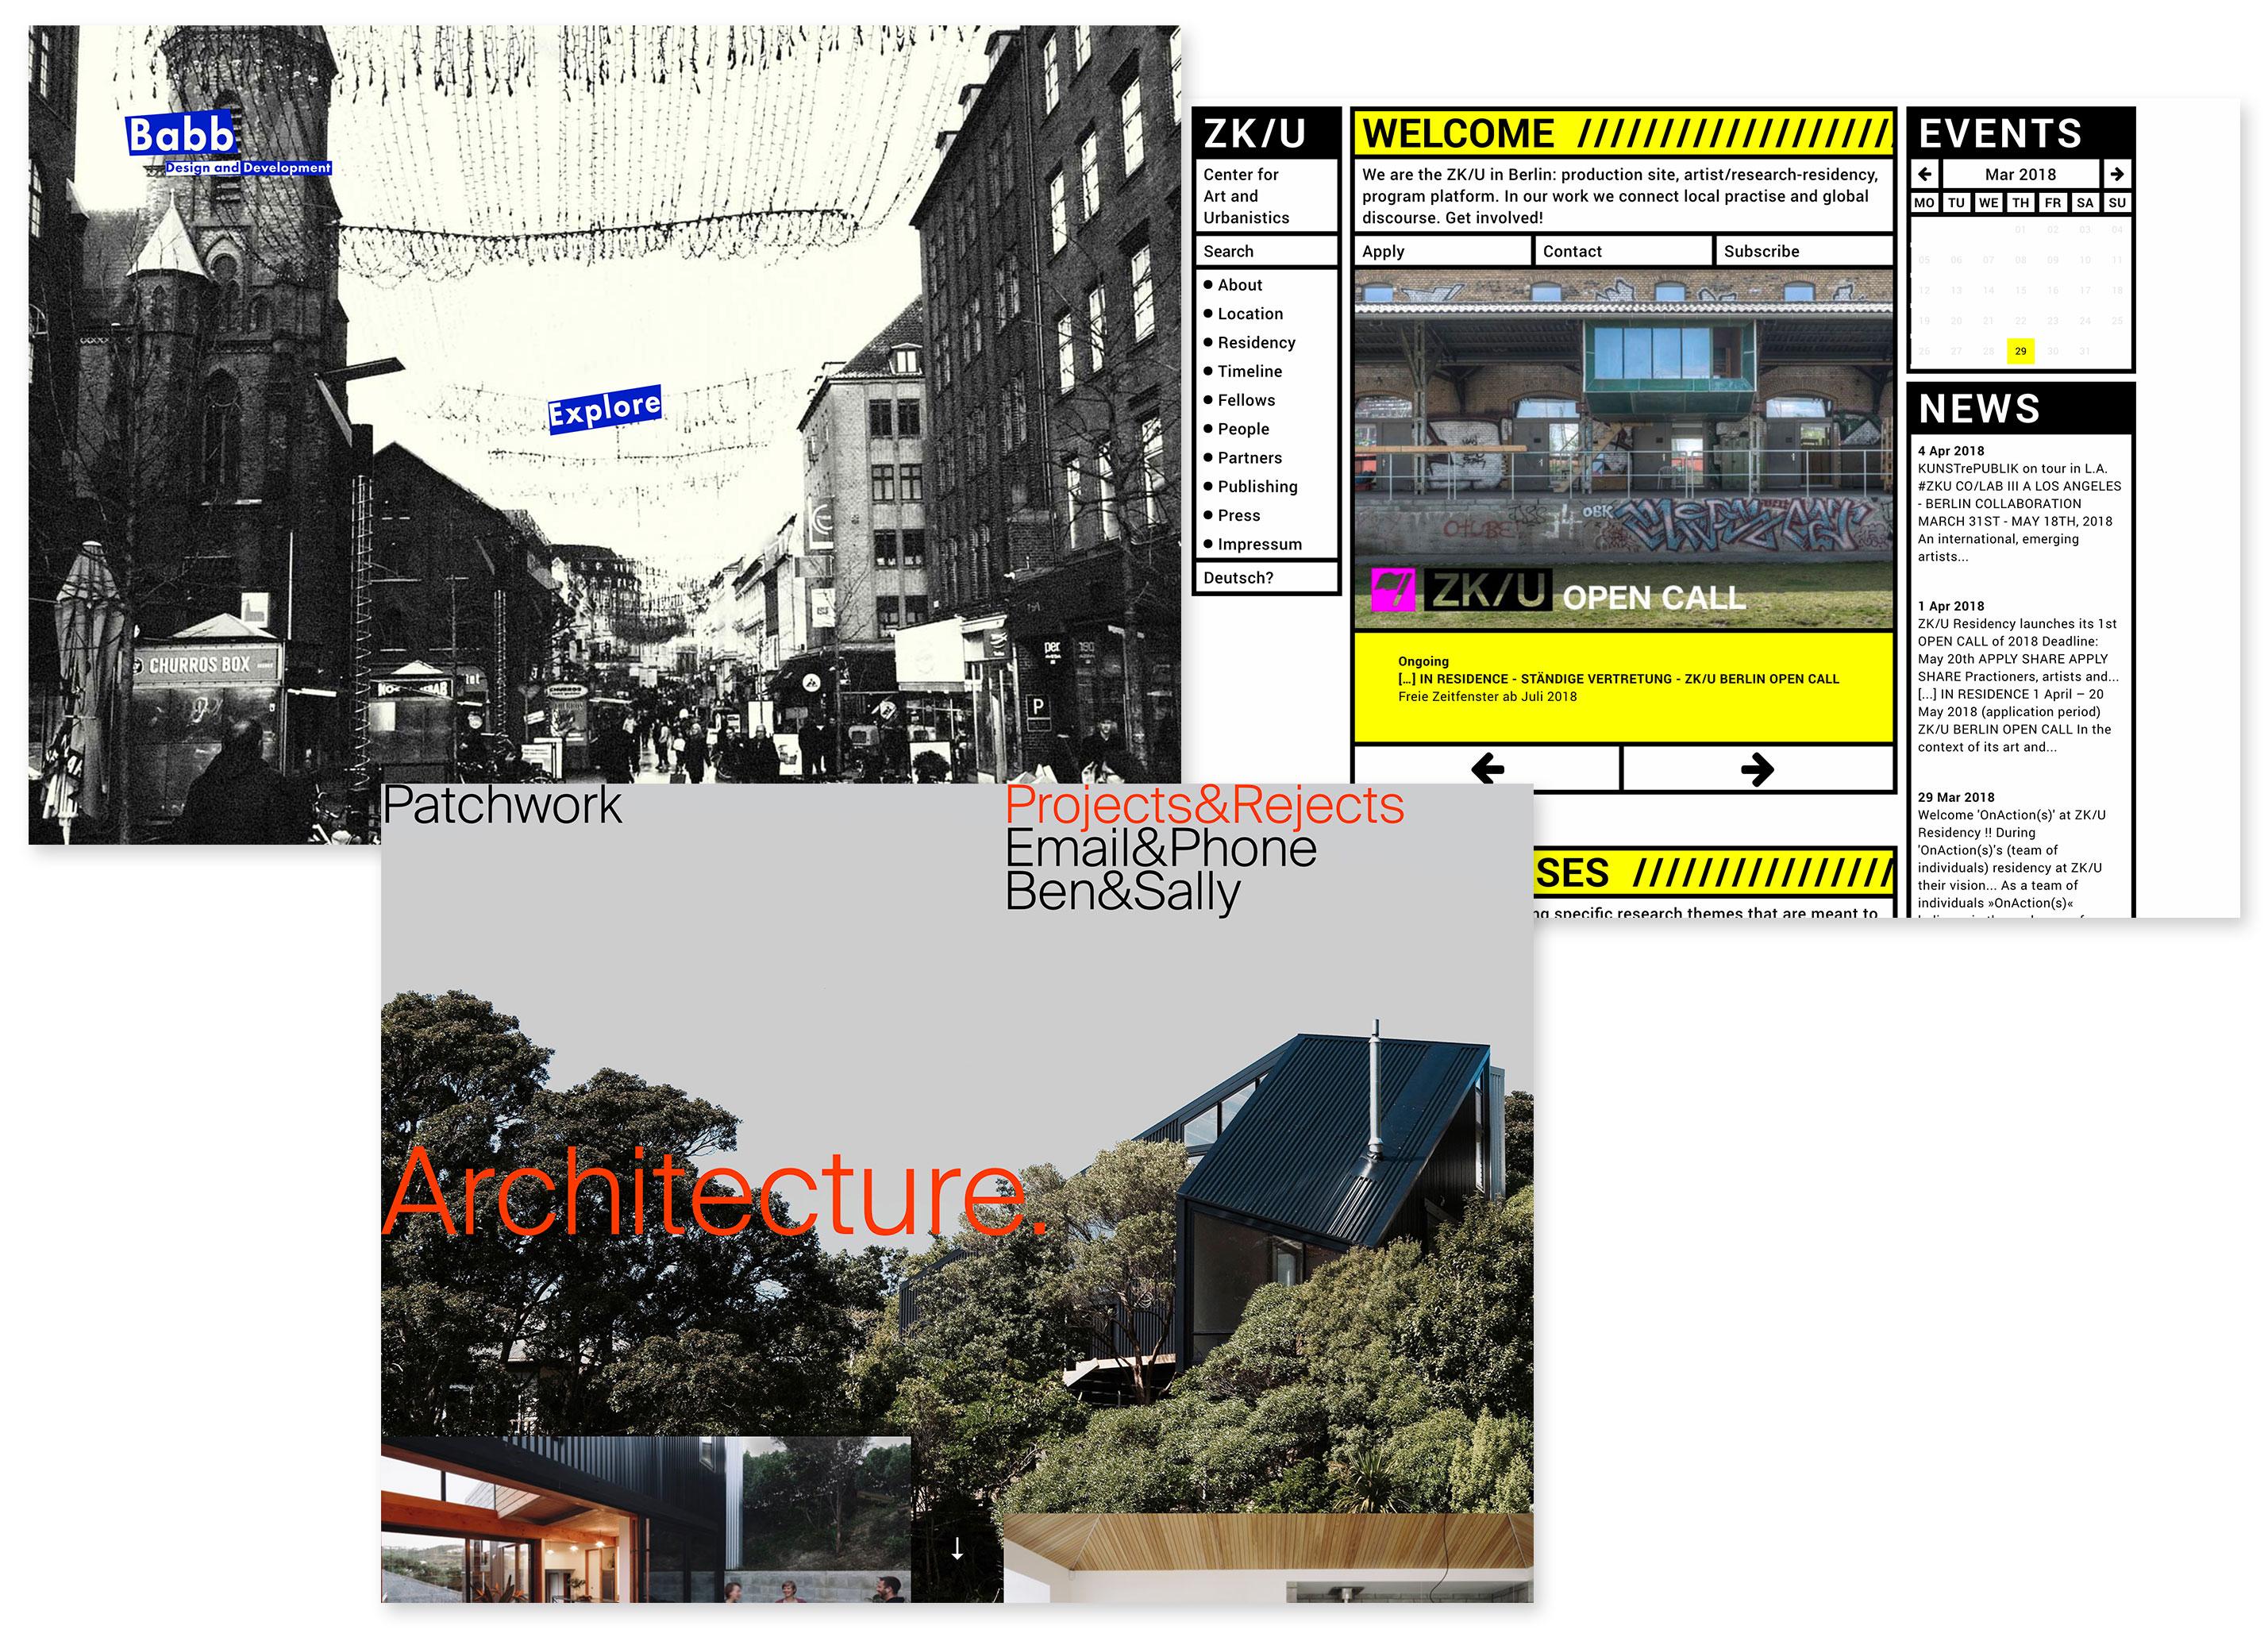 http://christopherbabb.com; http://www.zku-berlin.org; http://patchworkarchitecture.co.nz